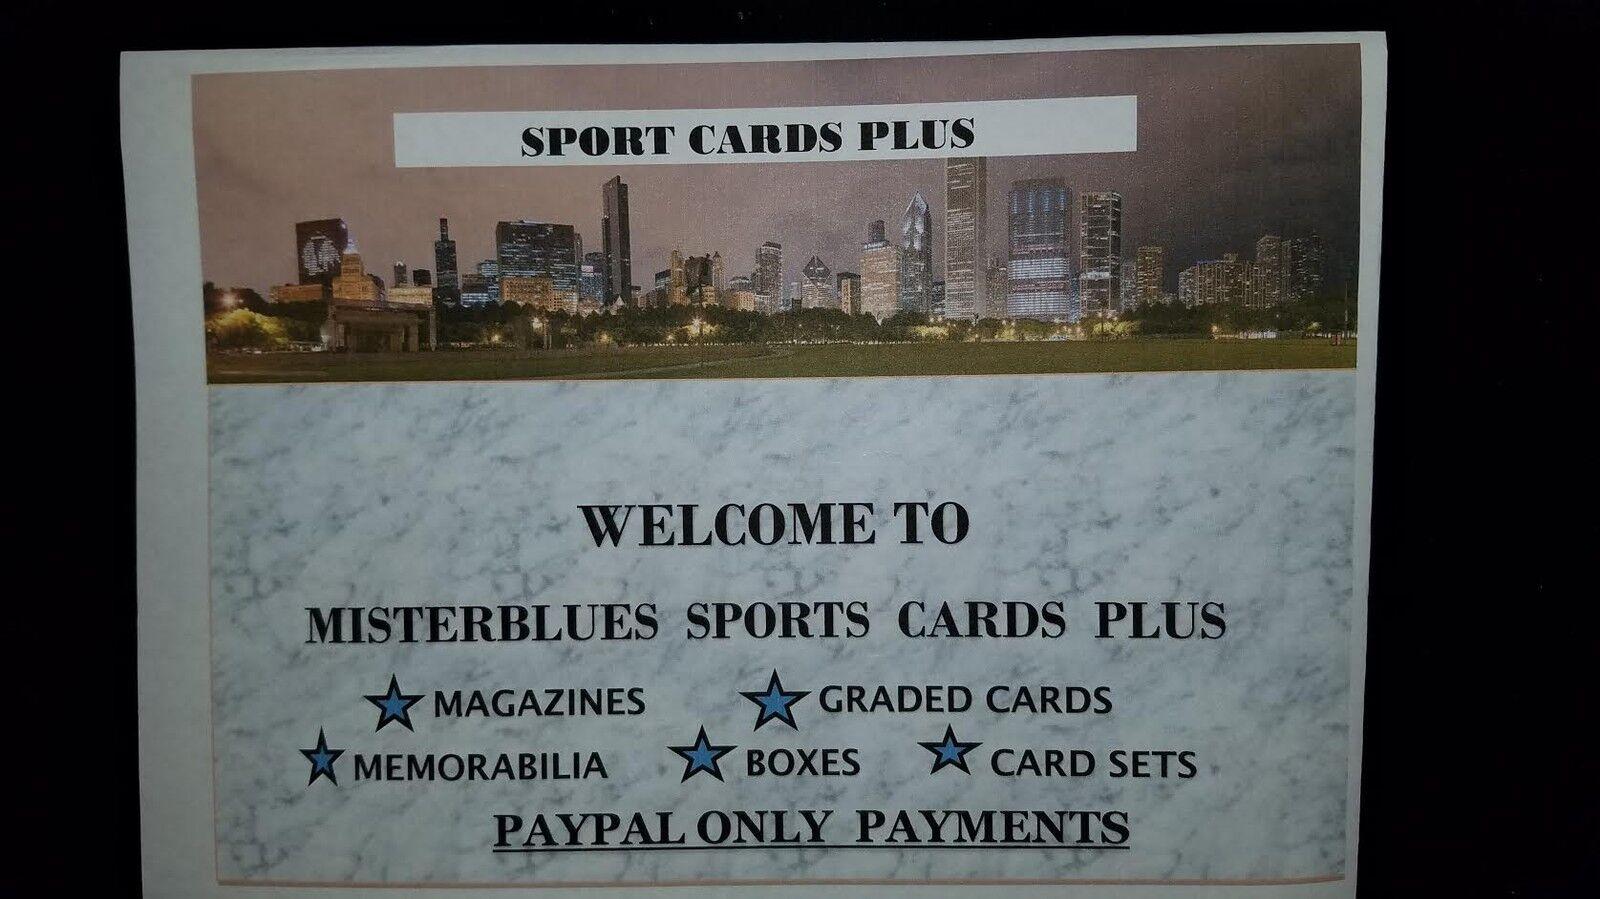 MISTERBLUES SPORTS CARD PLUS